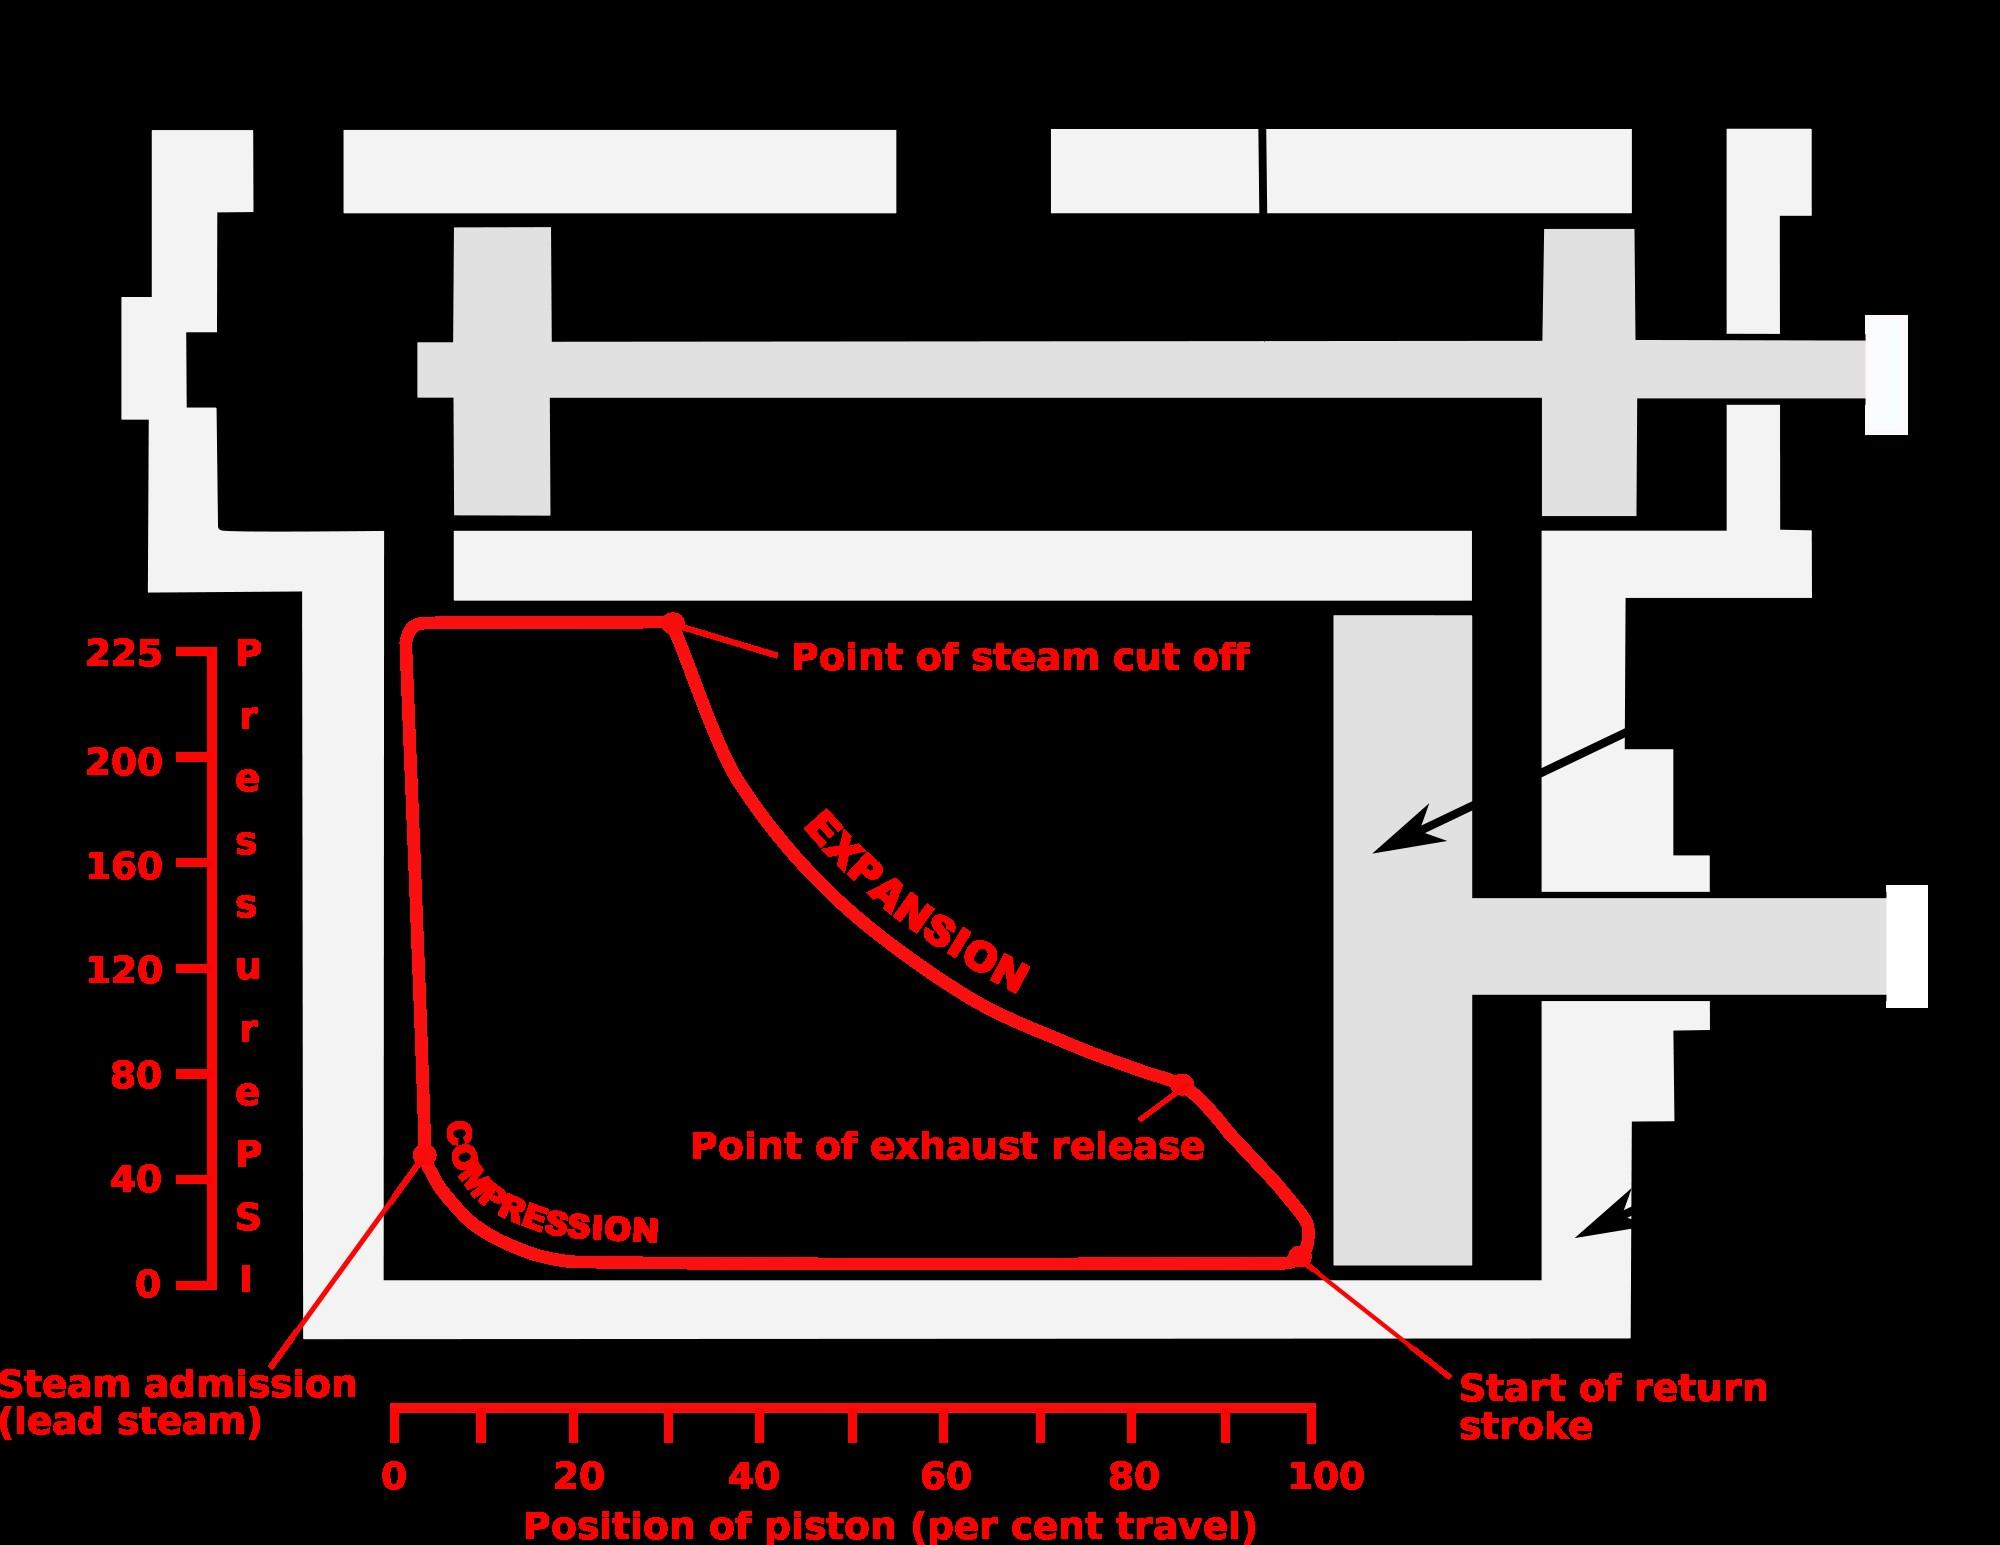 Engine Indicator Diagram File Indicator Diagram Steam Admissiong Wikimedia Mons Of Engine Indicator Diagram